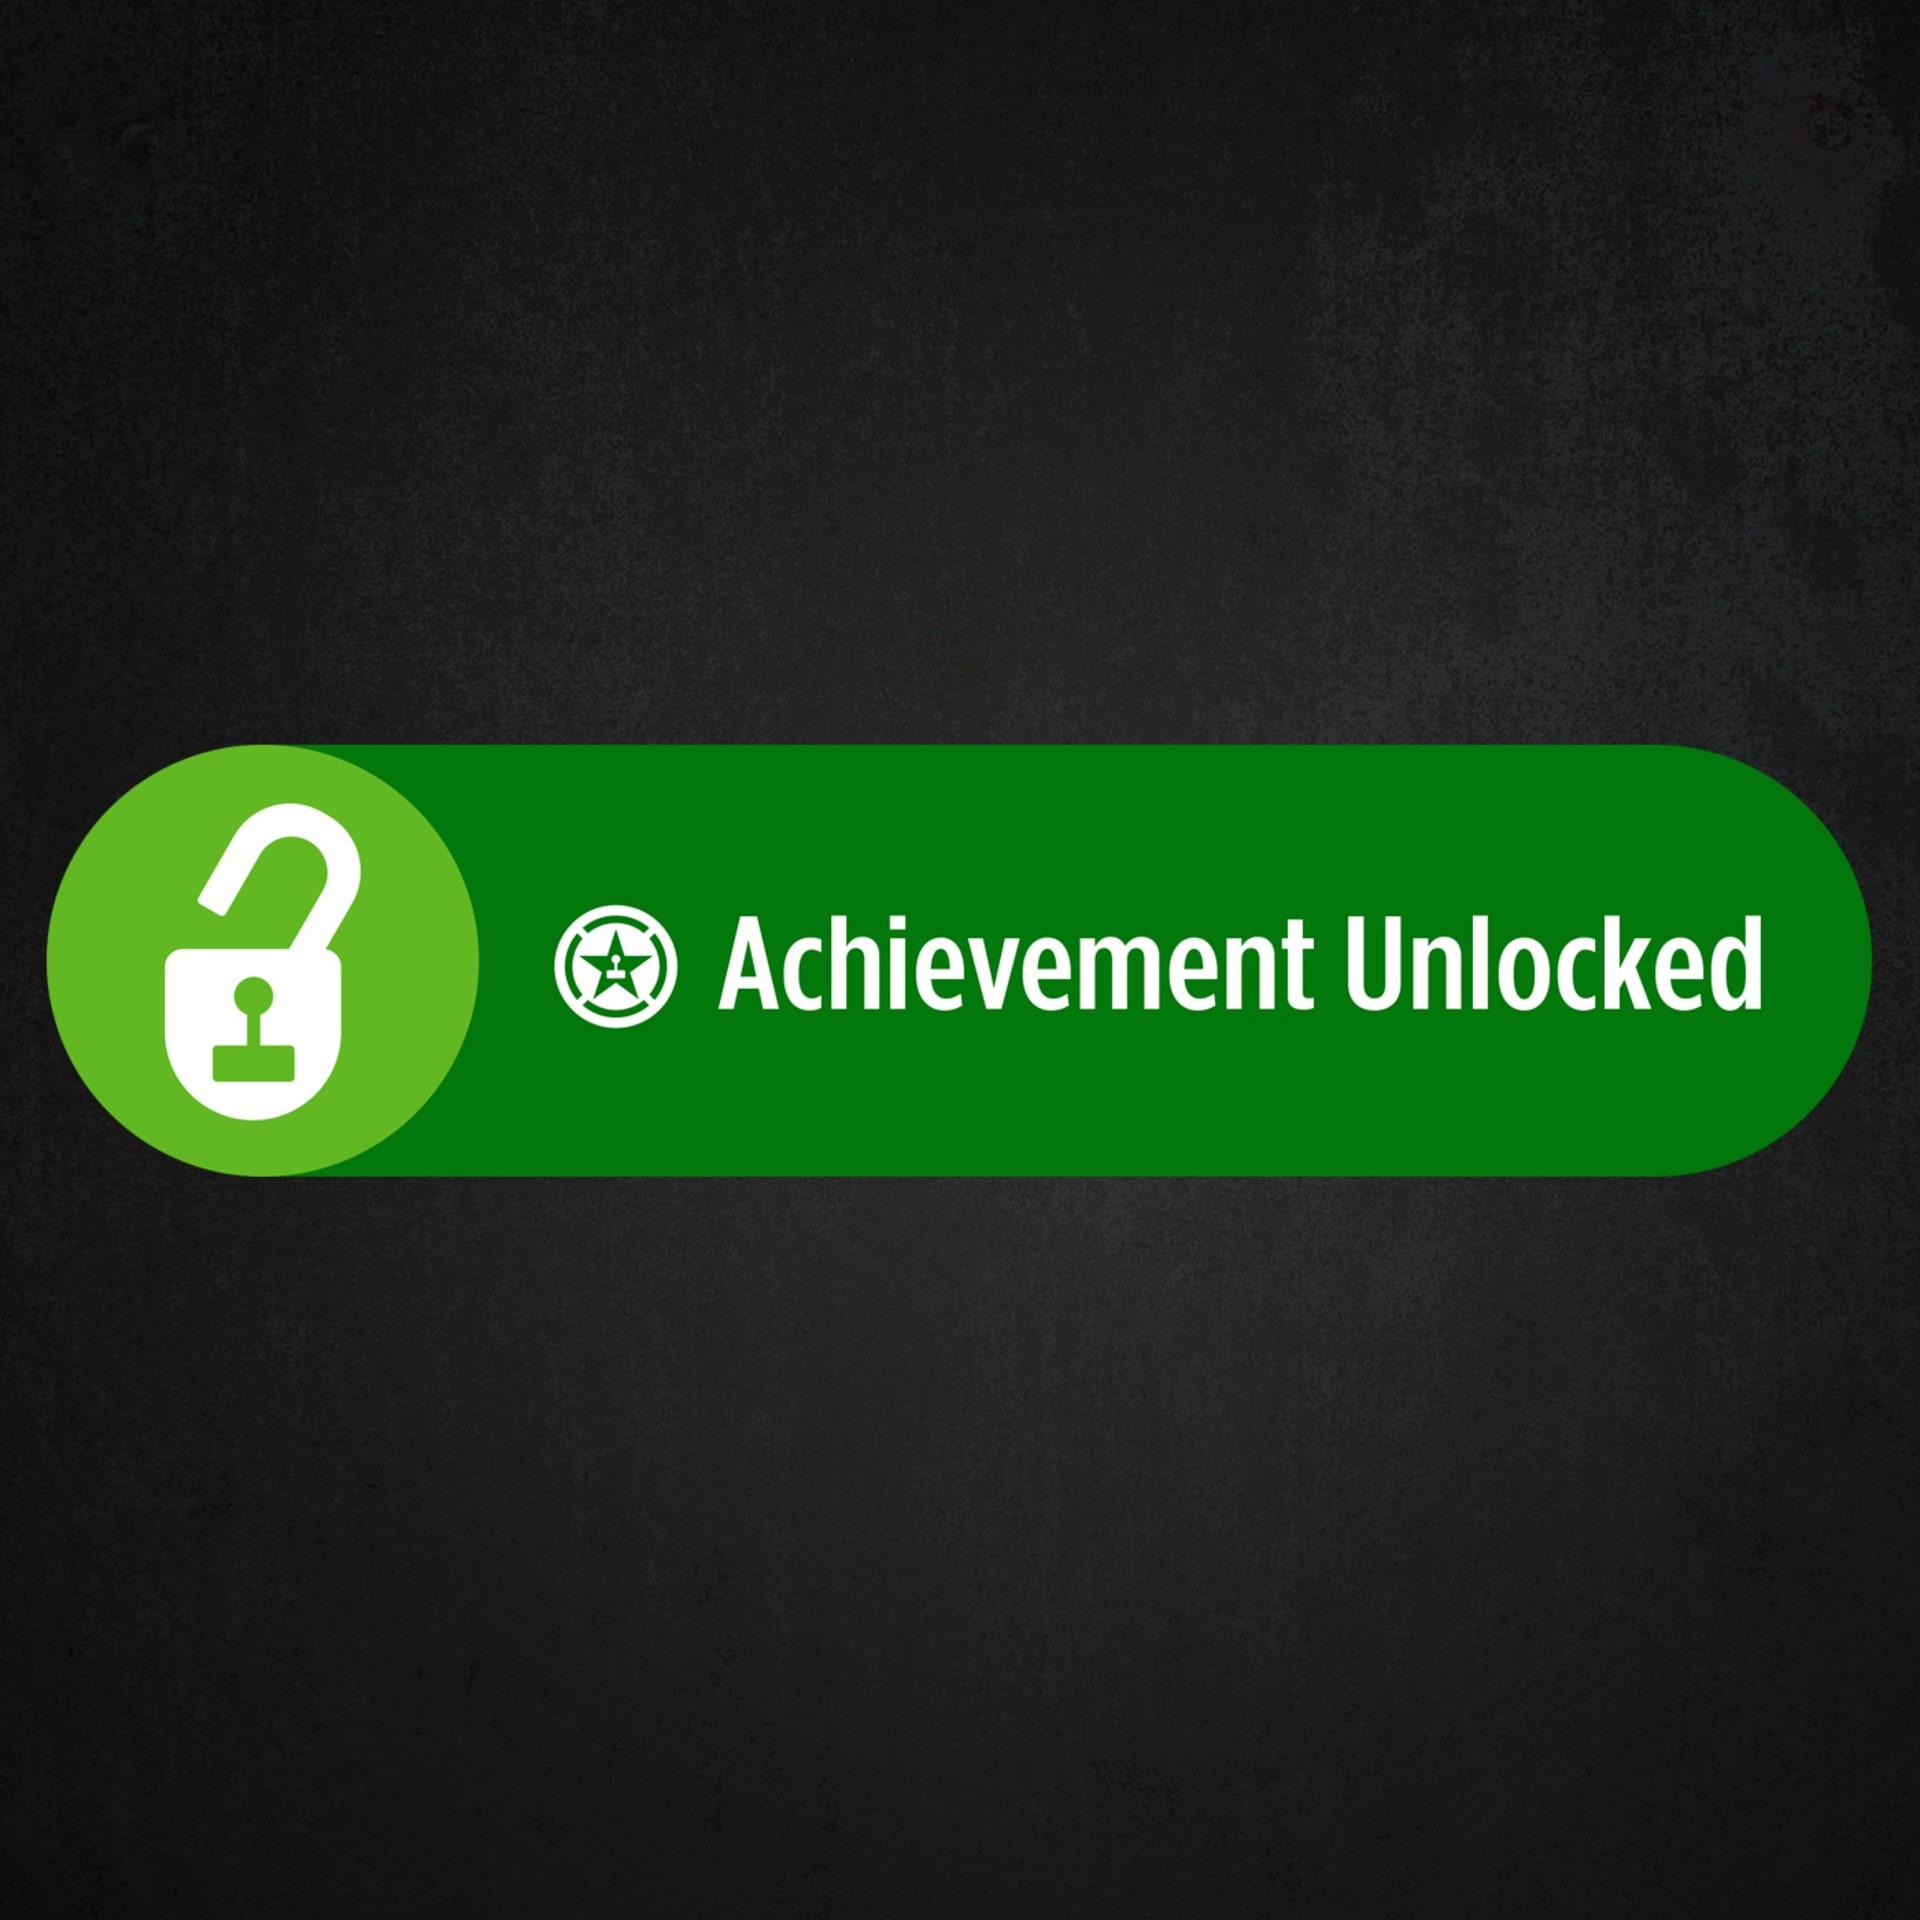 AchievementUnlockedSquare.jpg